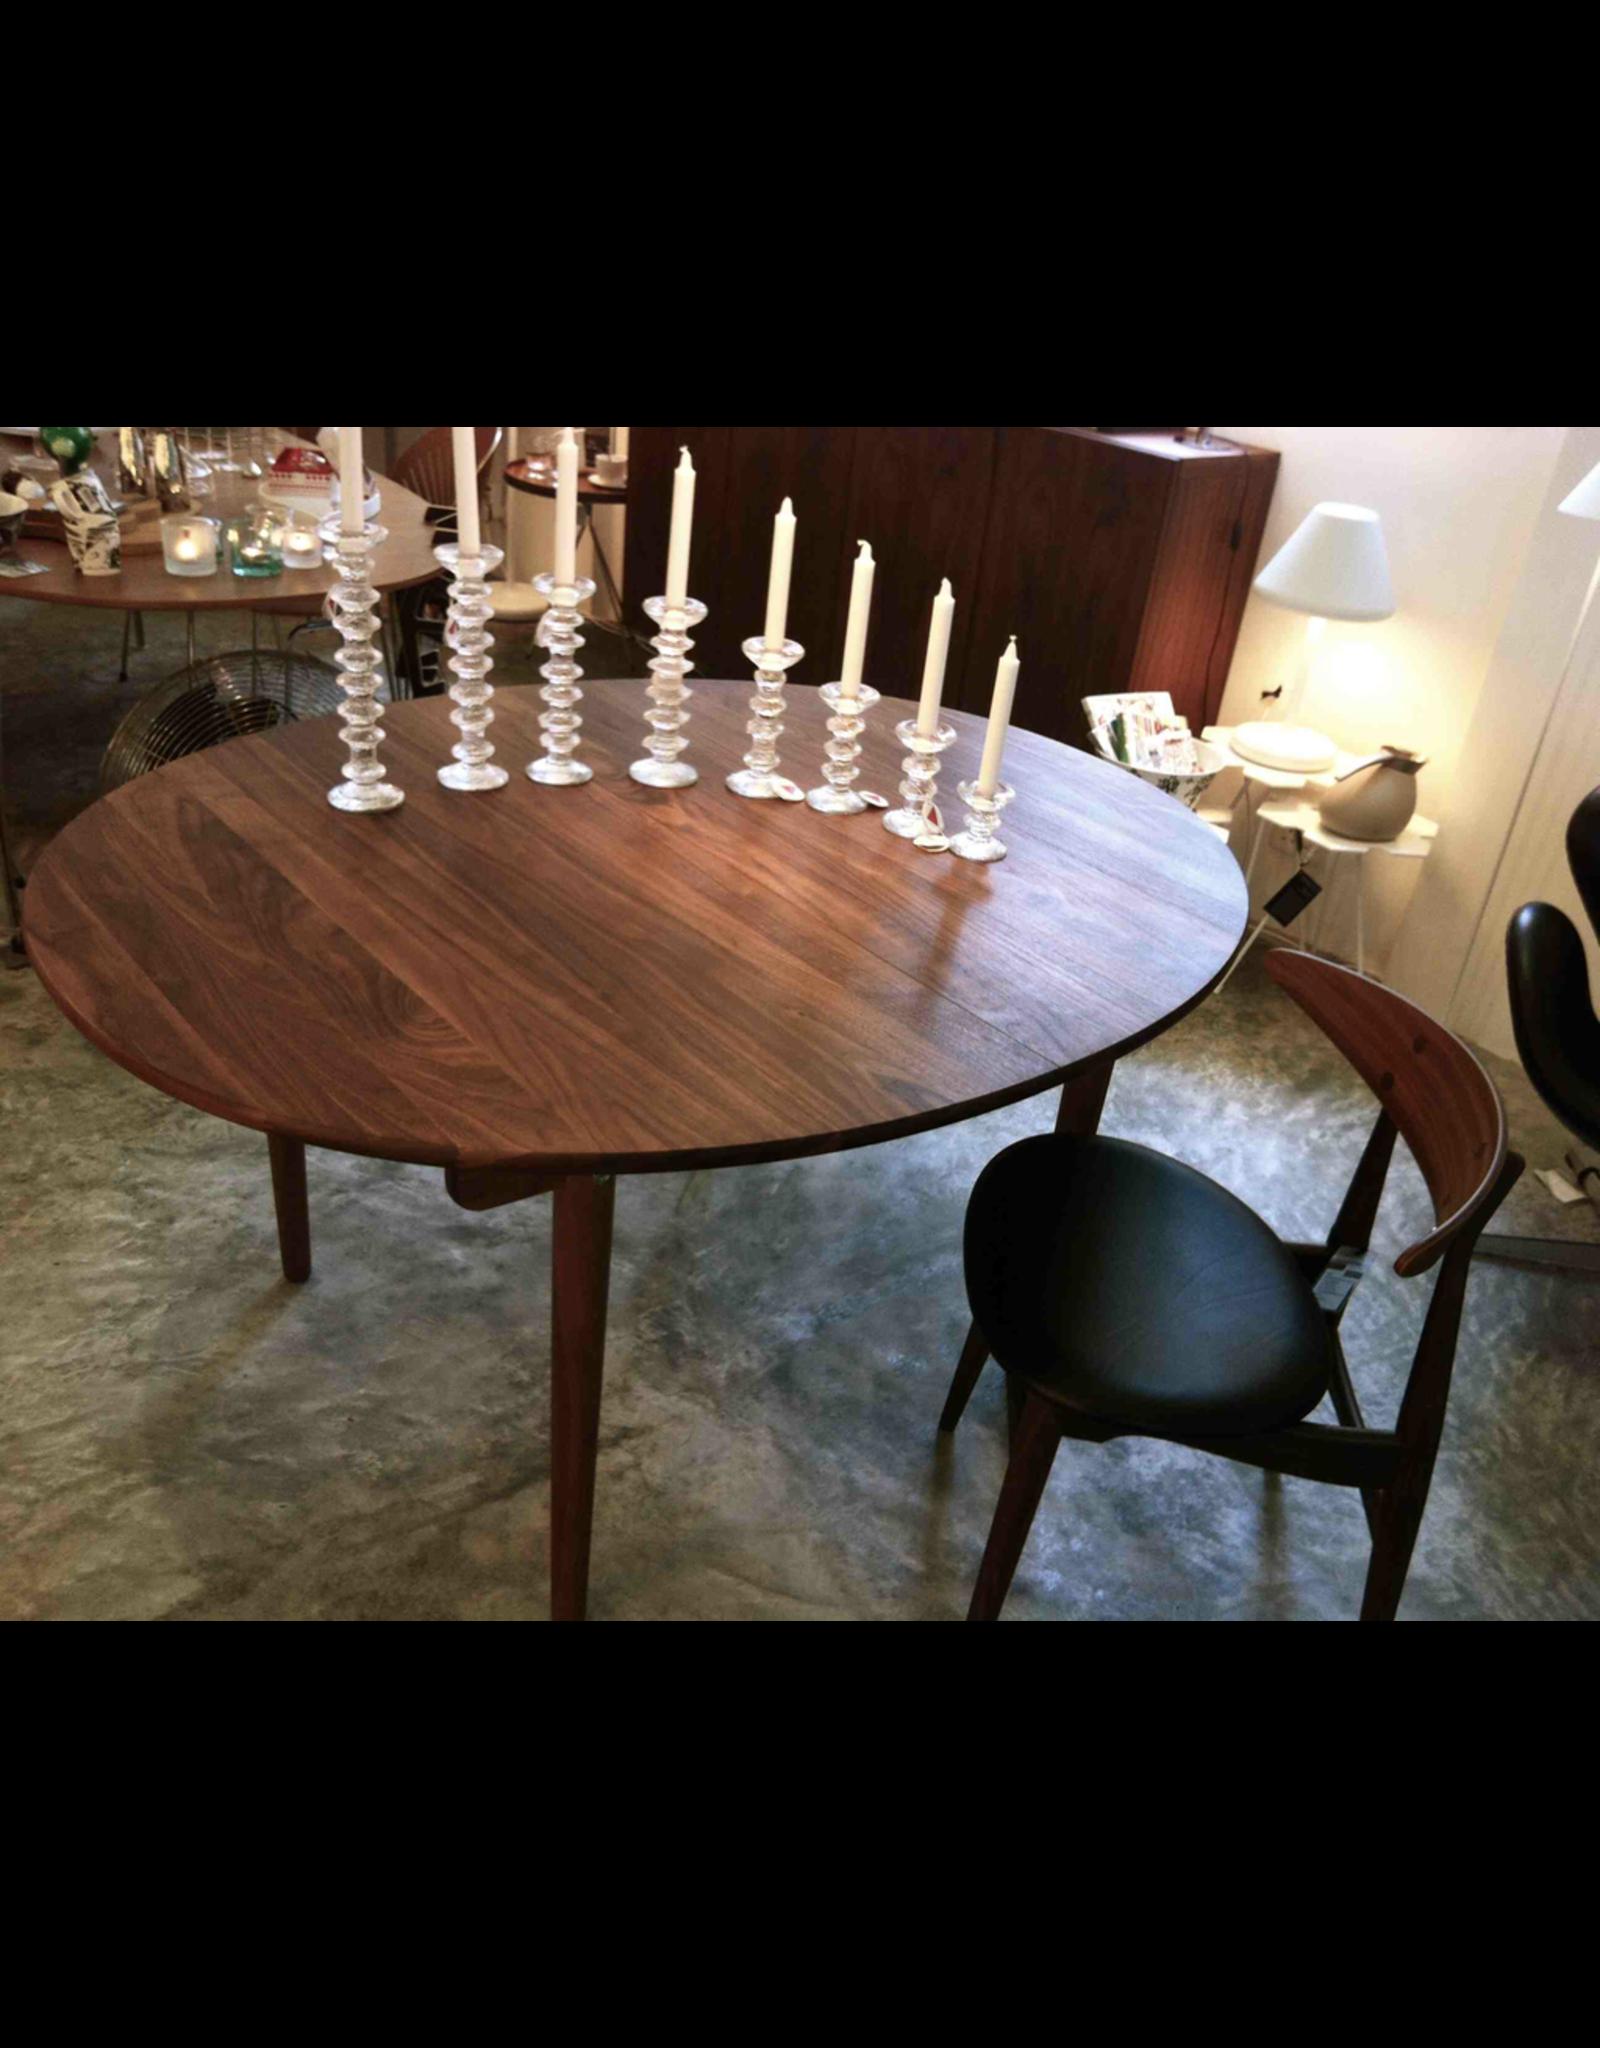 CH337實心胡桃木橢圓可延伸餐桌